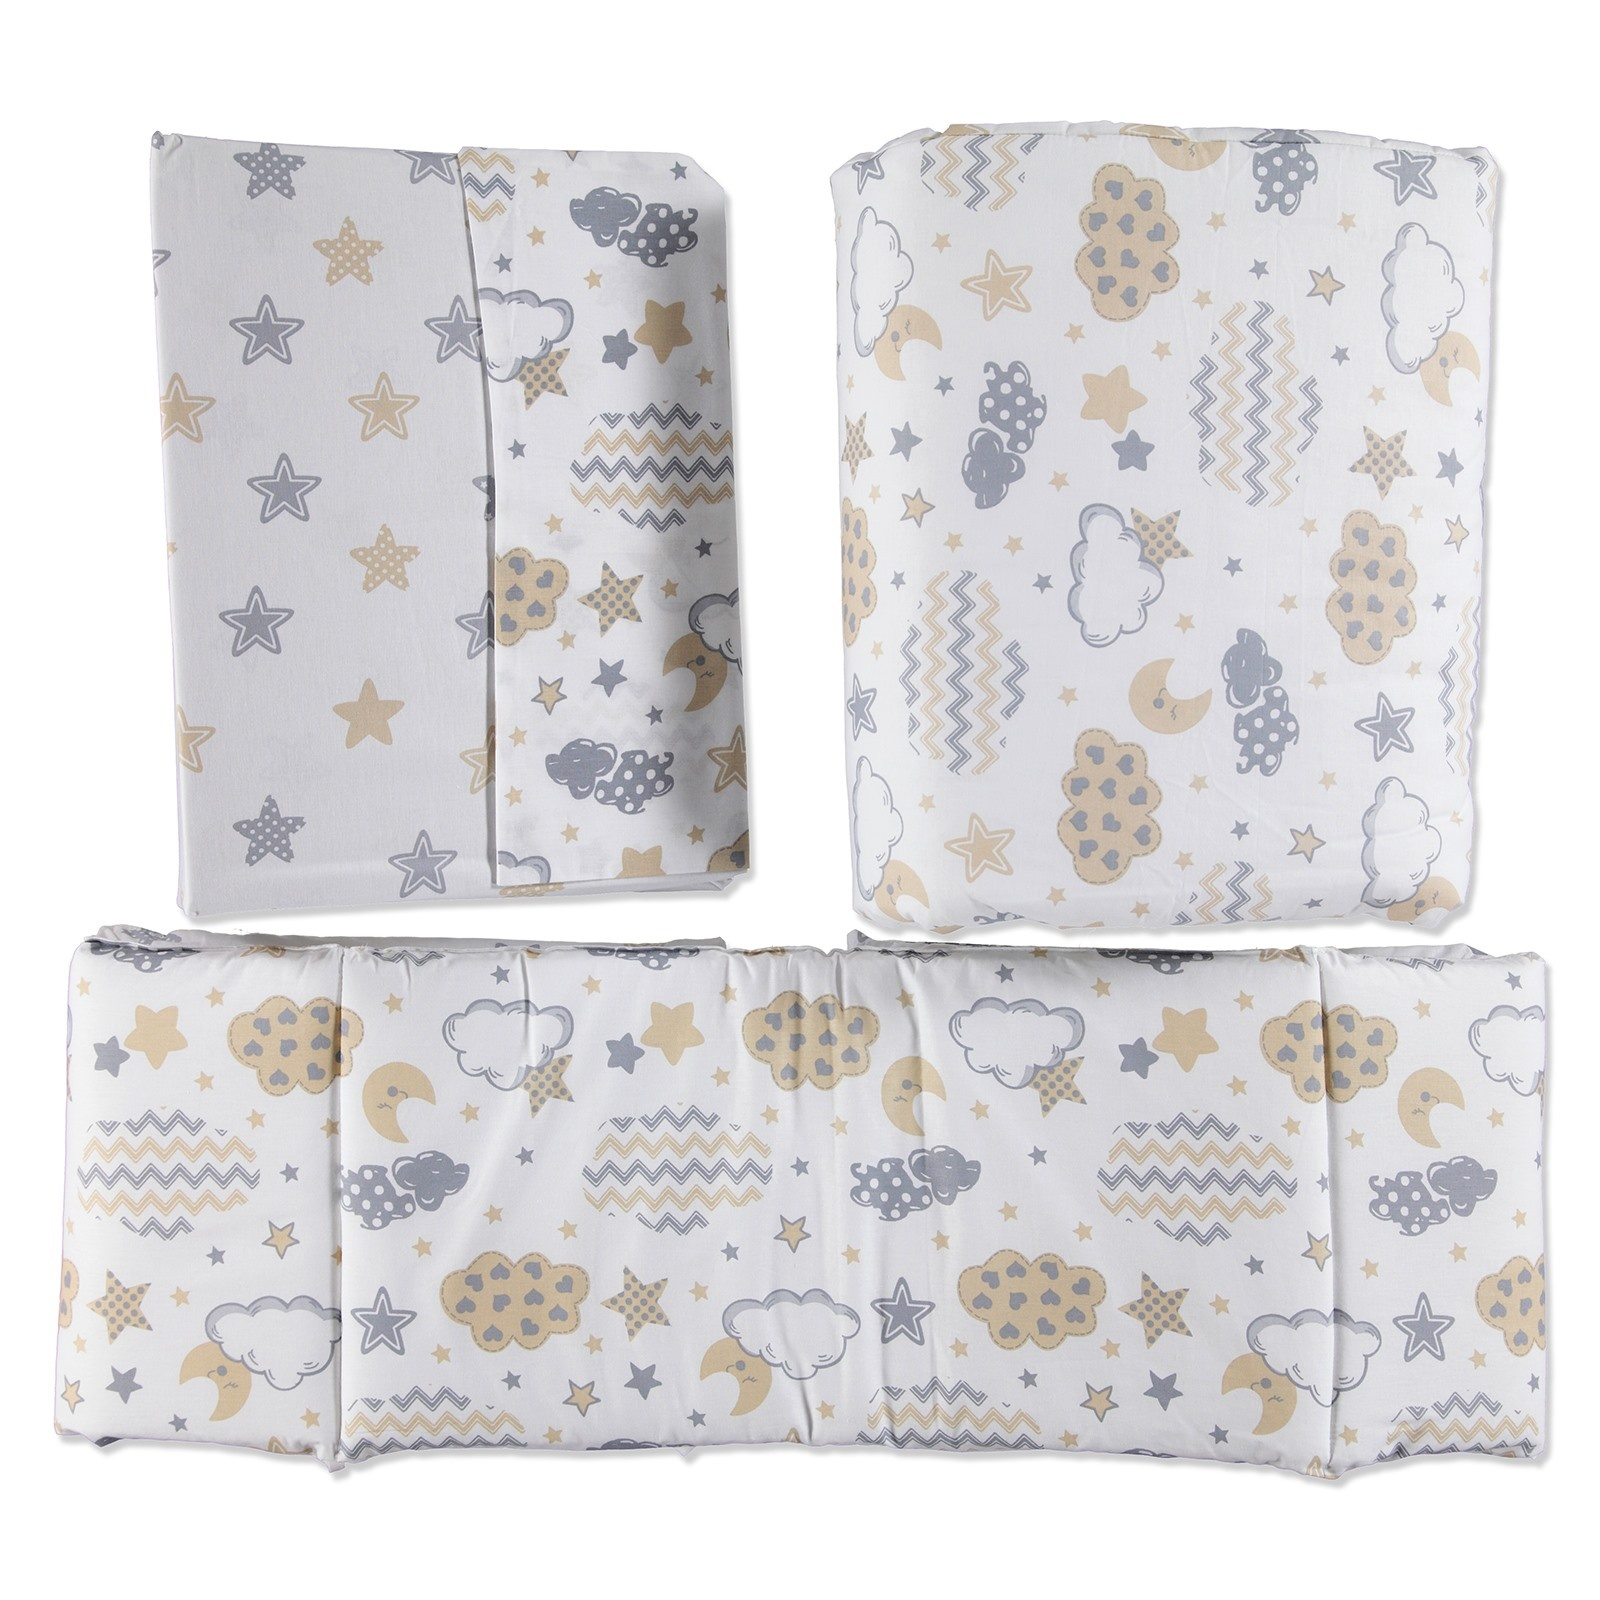 86 cm Cotton Travel Bag Baby Sleeping Bag 6-18 Months Pattern 22